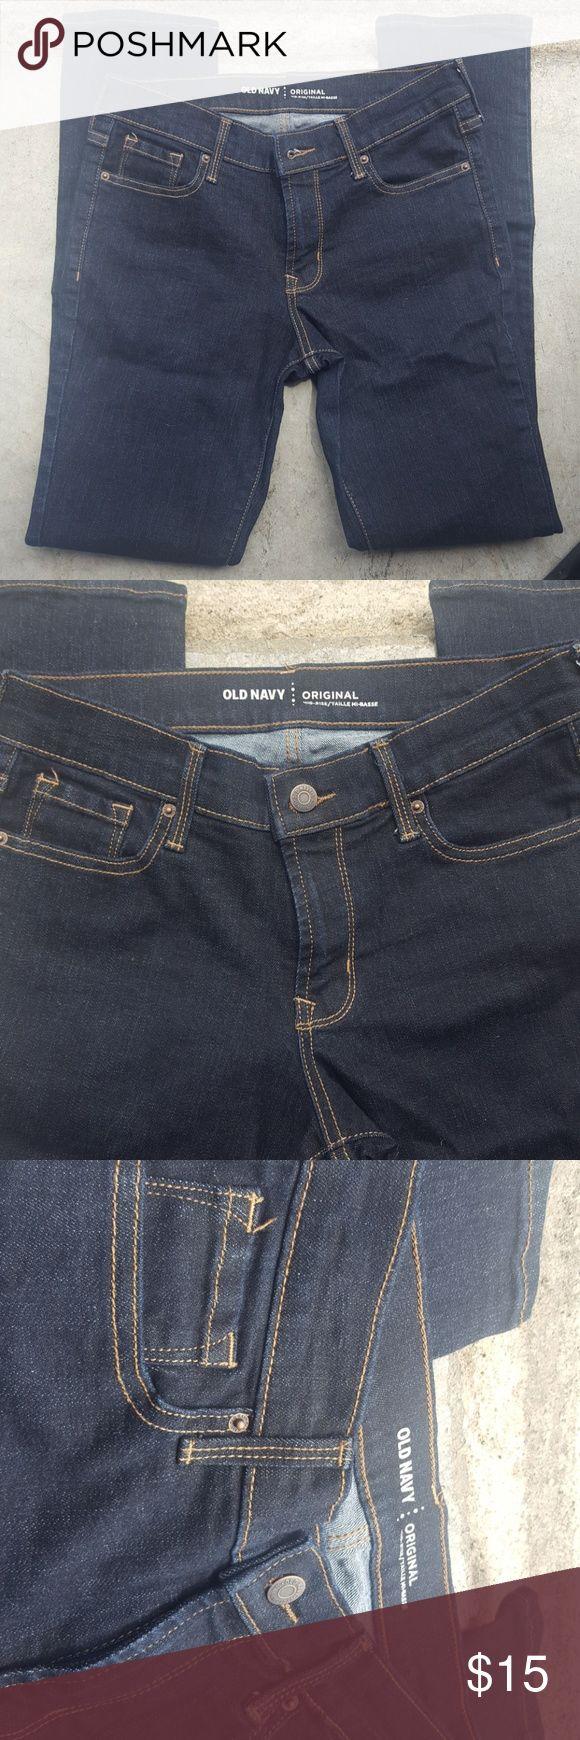 Women's Old Navy Original Mid Rise Jeans size 2 Old Navy Original Straight Mid Rise Jeans size 2 Regular. Beautiful dark wash, never been worn. 85% cotton, 13% polyester, 2% spandex Old Navy Jeans Straight Leg